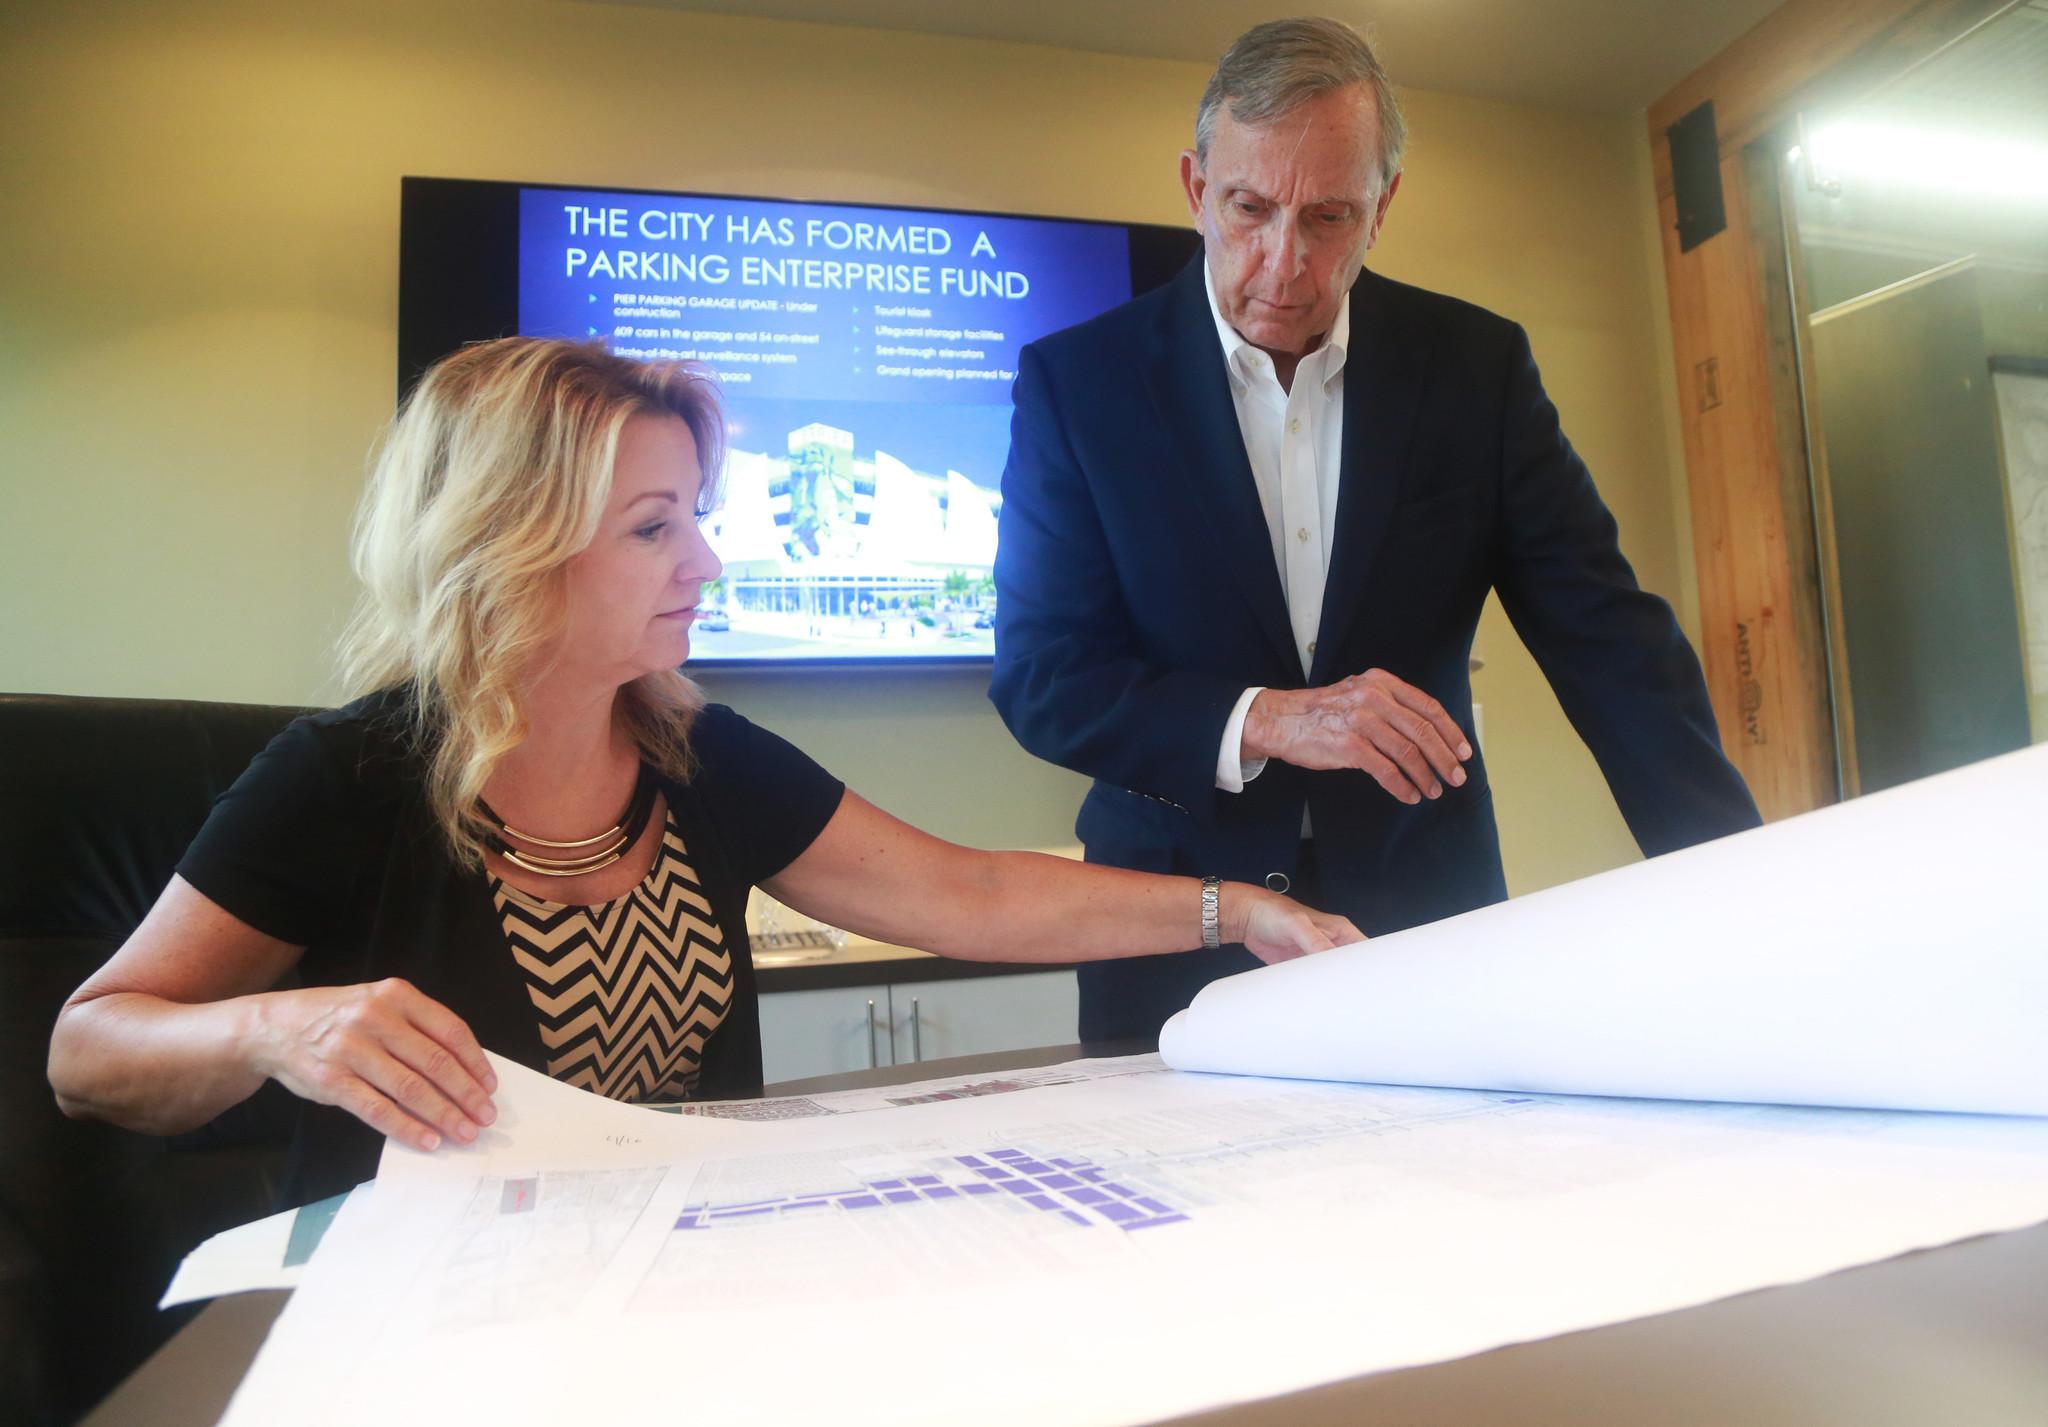 pompano beach company reinvents cities